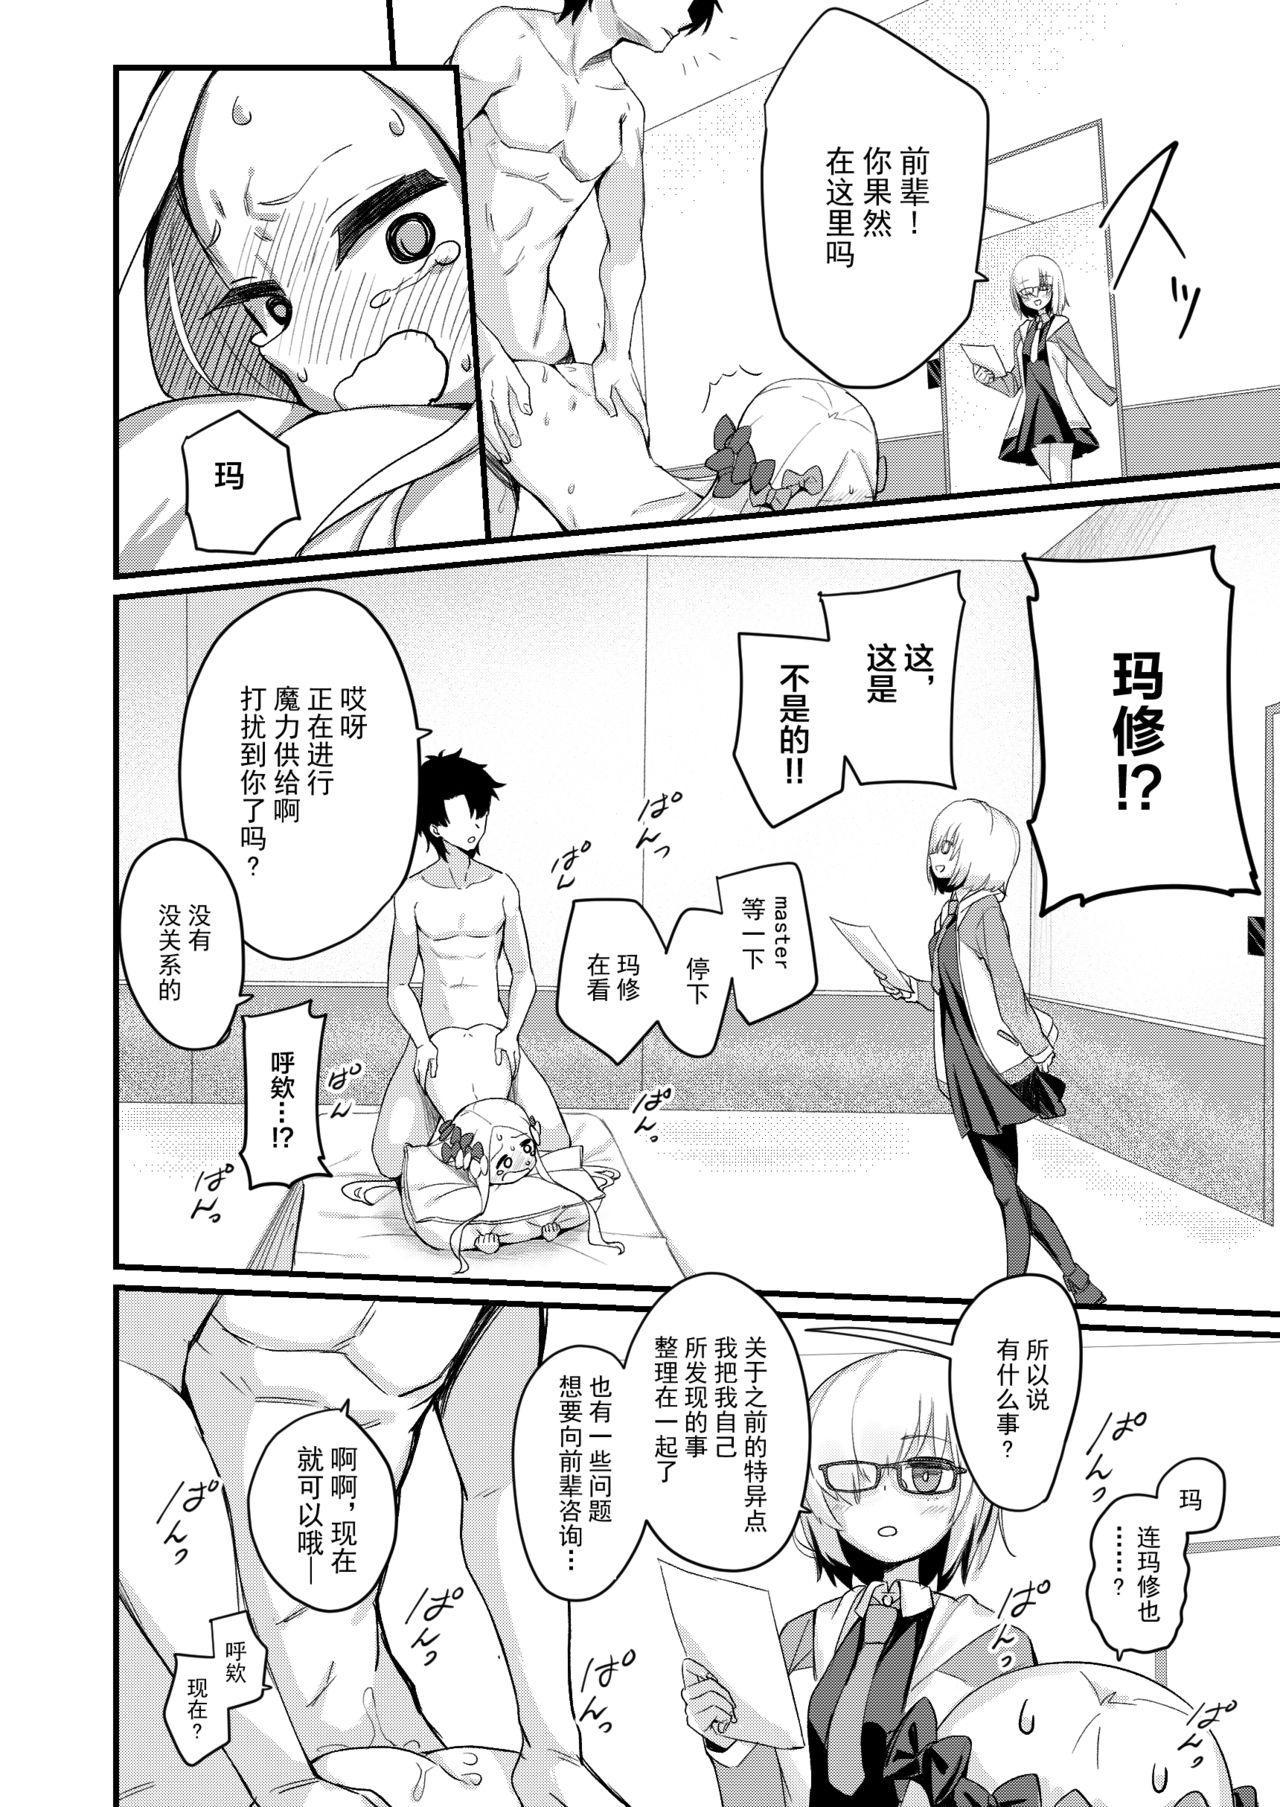 Ikenai Koto ja Nai kara 17